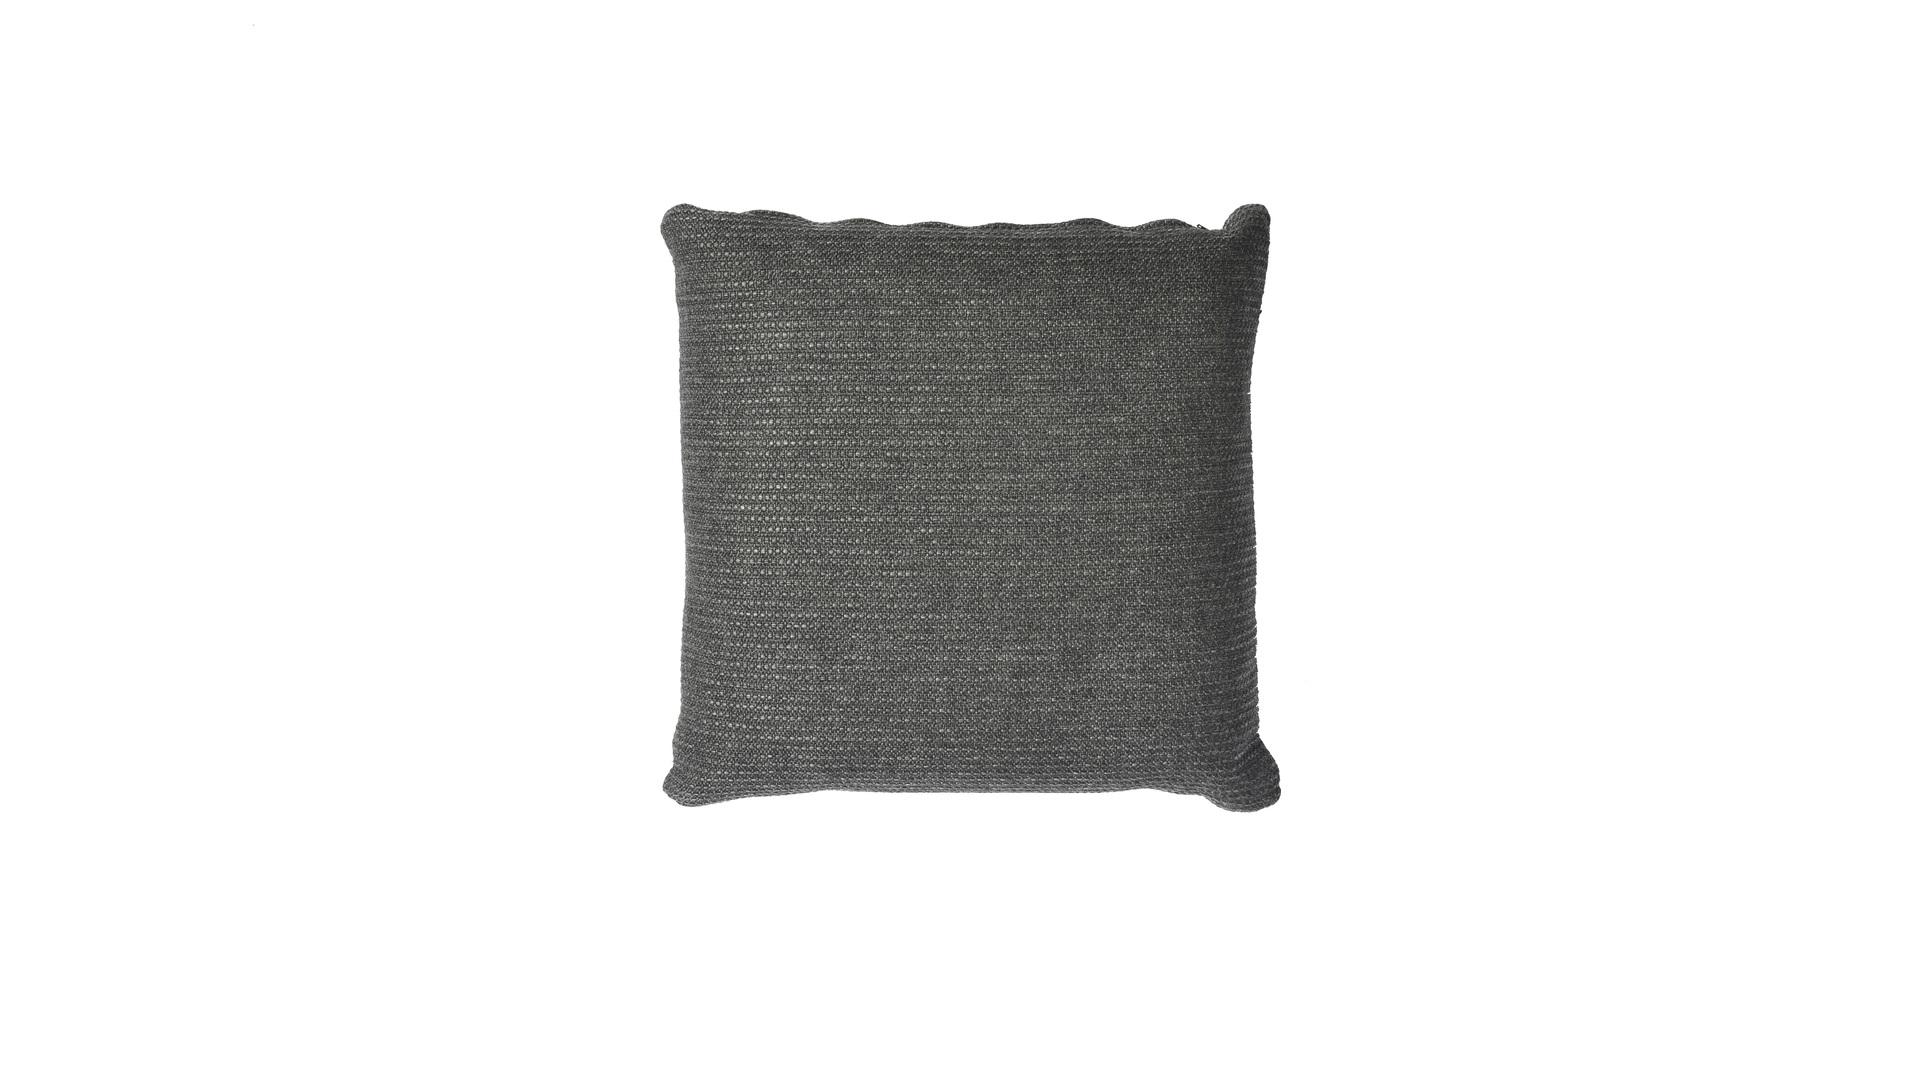 2020 Borek Prato decorative cushion 50x50 charcoal KS541-11170 2.jpg